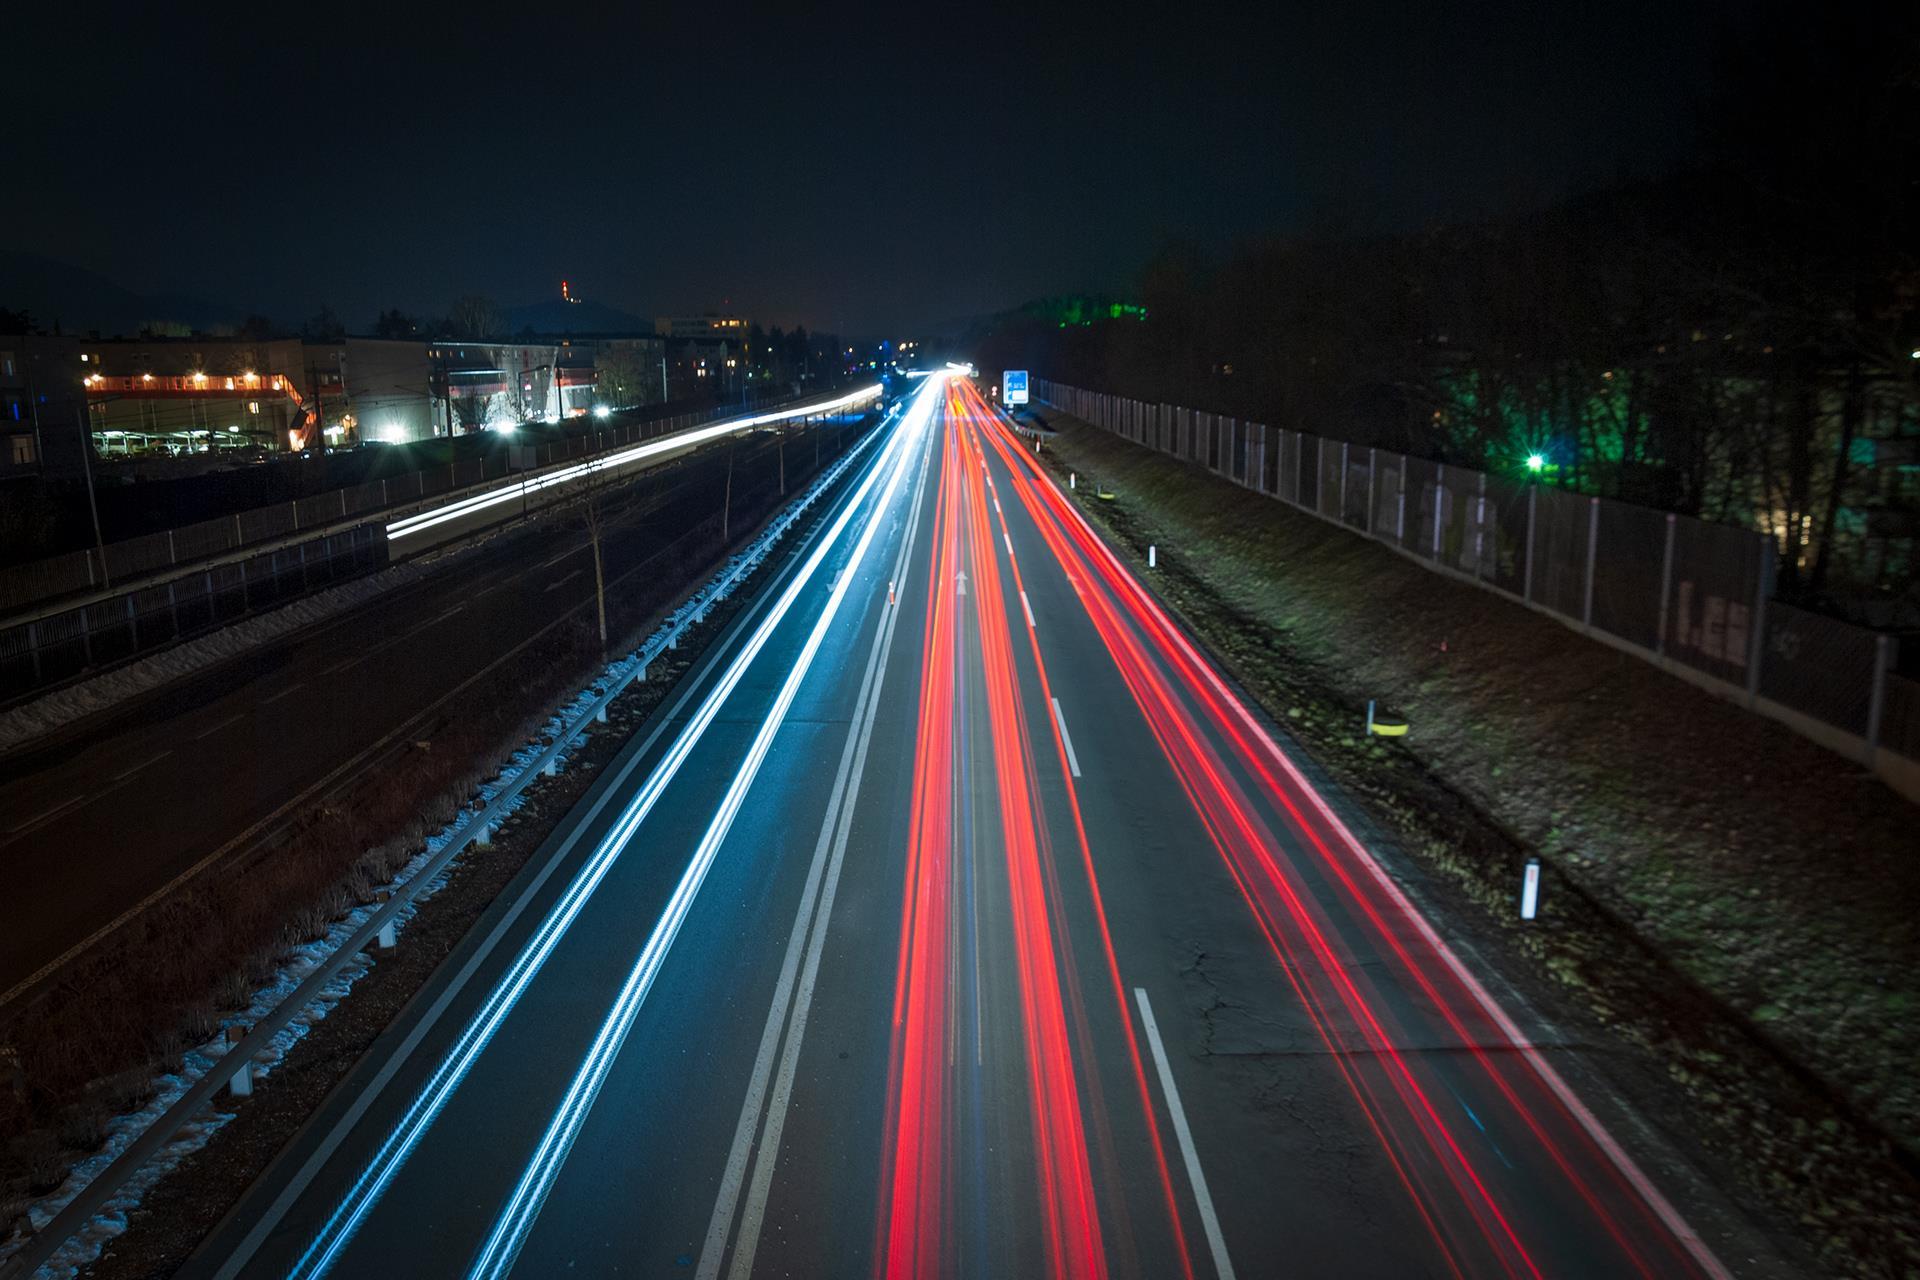 -Autobahnbruecke1920x1280